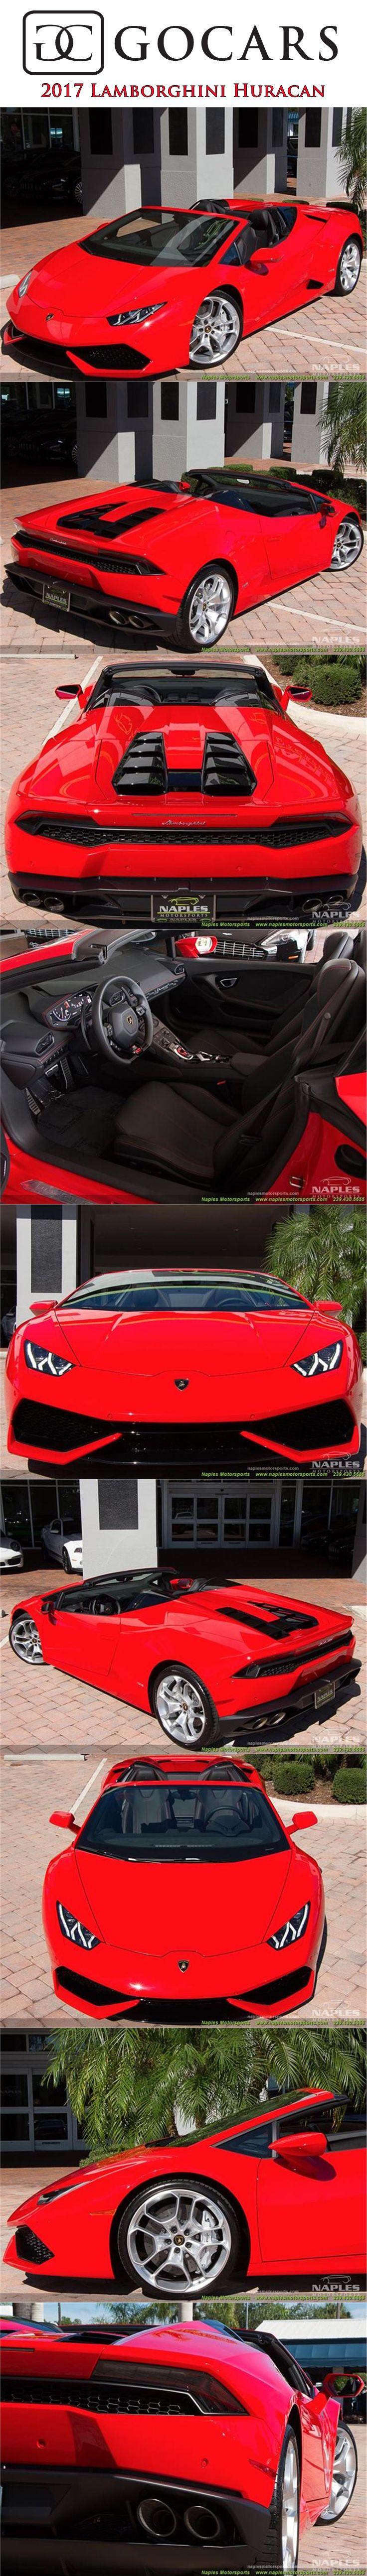 2647a72af77ef95e2a76d28df32832f4 Marvelous Lamborghini Huracan Hack asphalt 8 Cars Trend